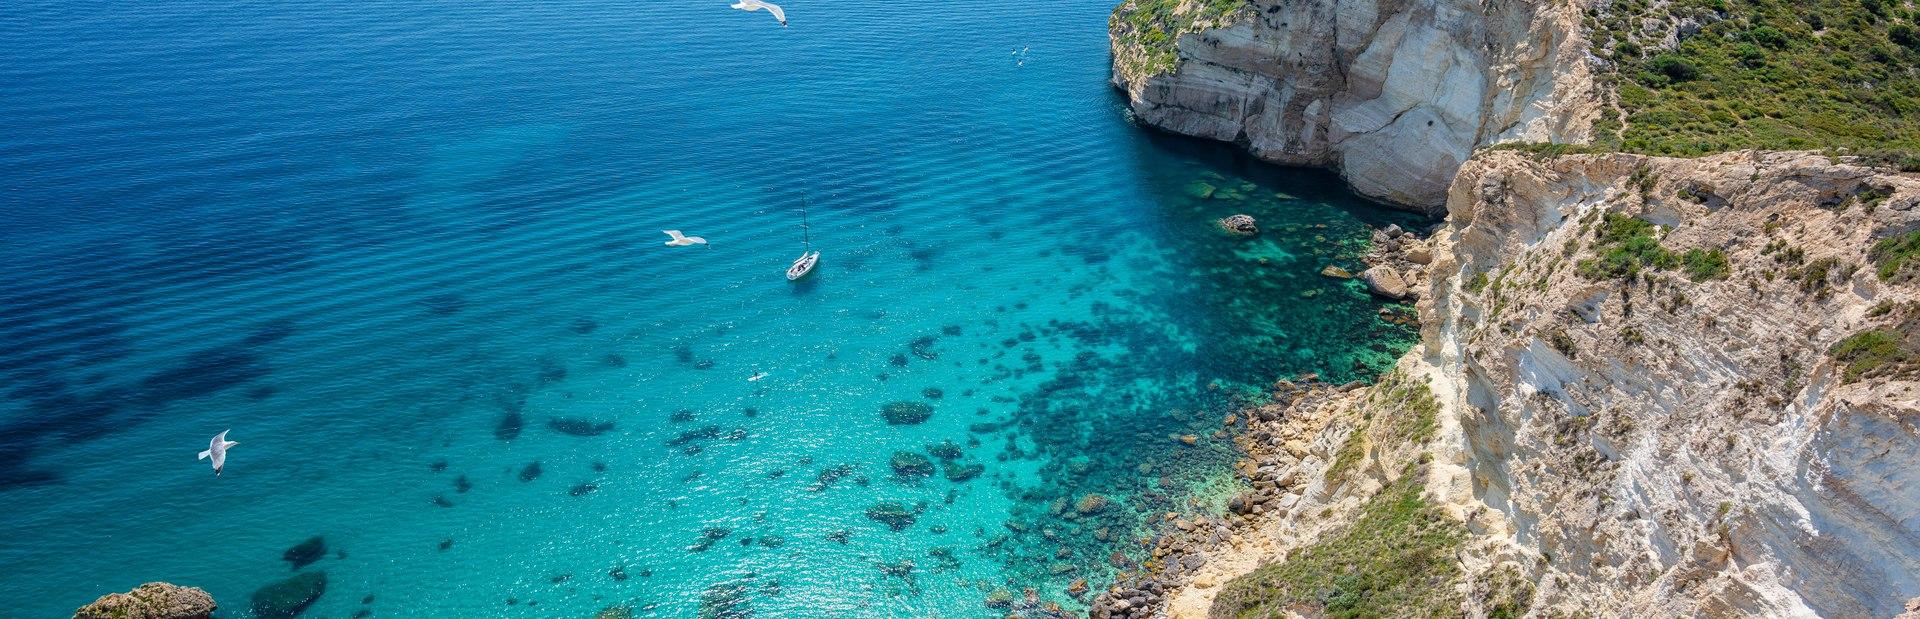 Cagliari charter itineraries